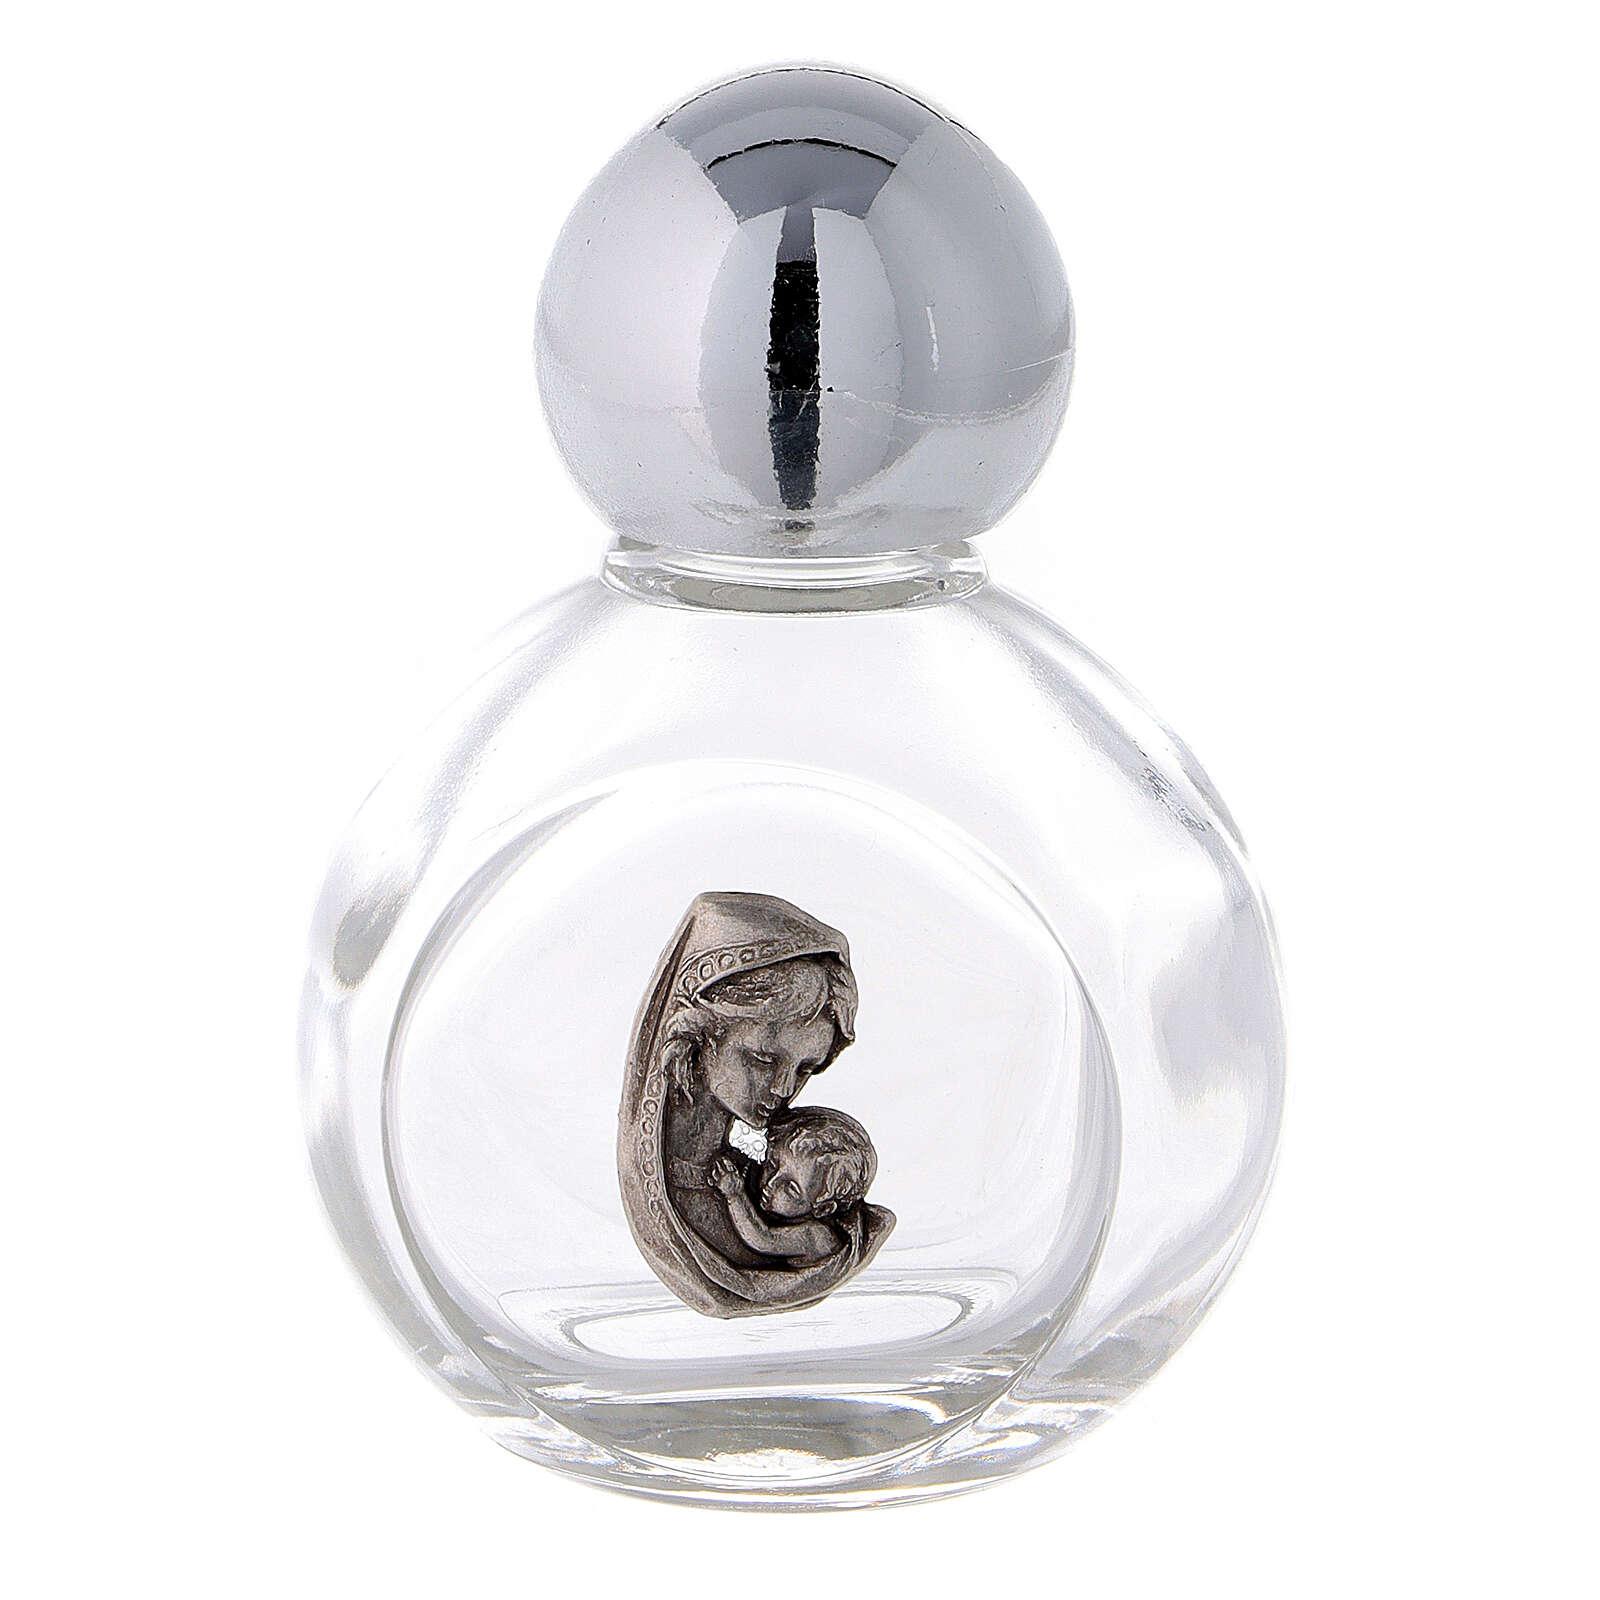 Bottiglietta acqua Benedetta Madonna e Bambino 35 ml (50 PZ.) vetro 3